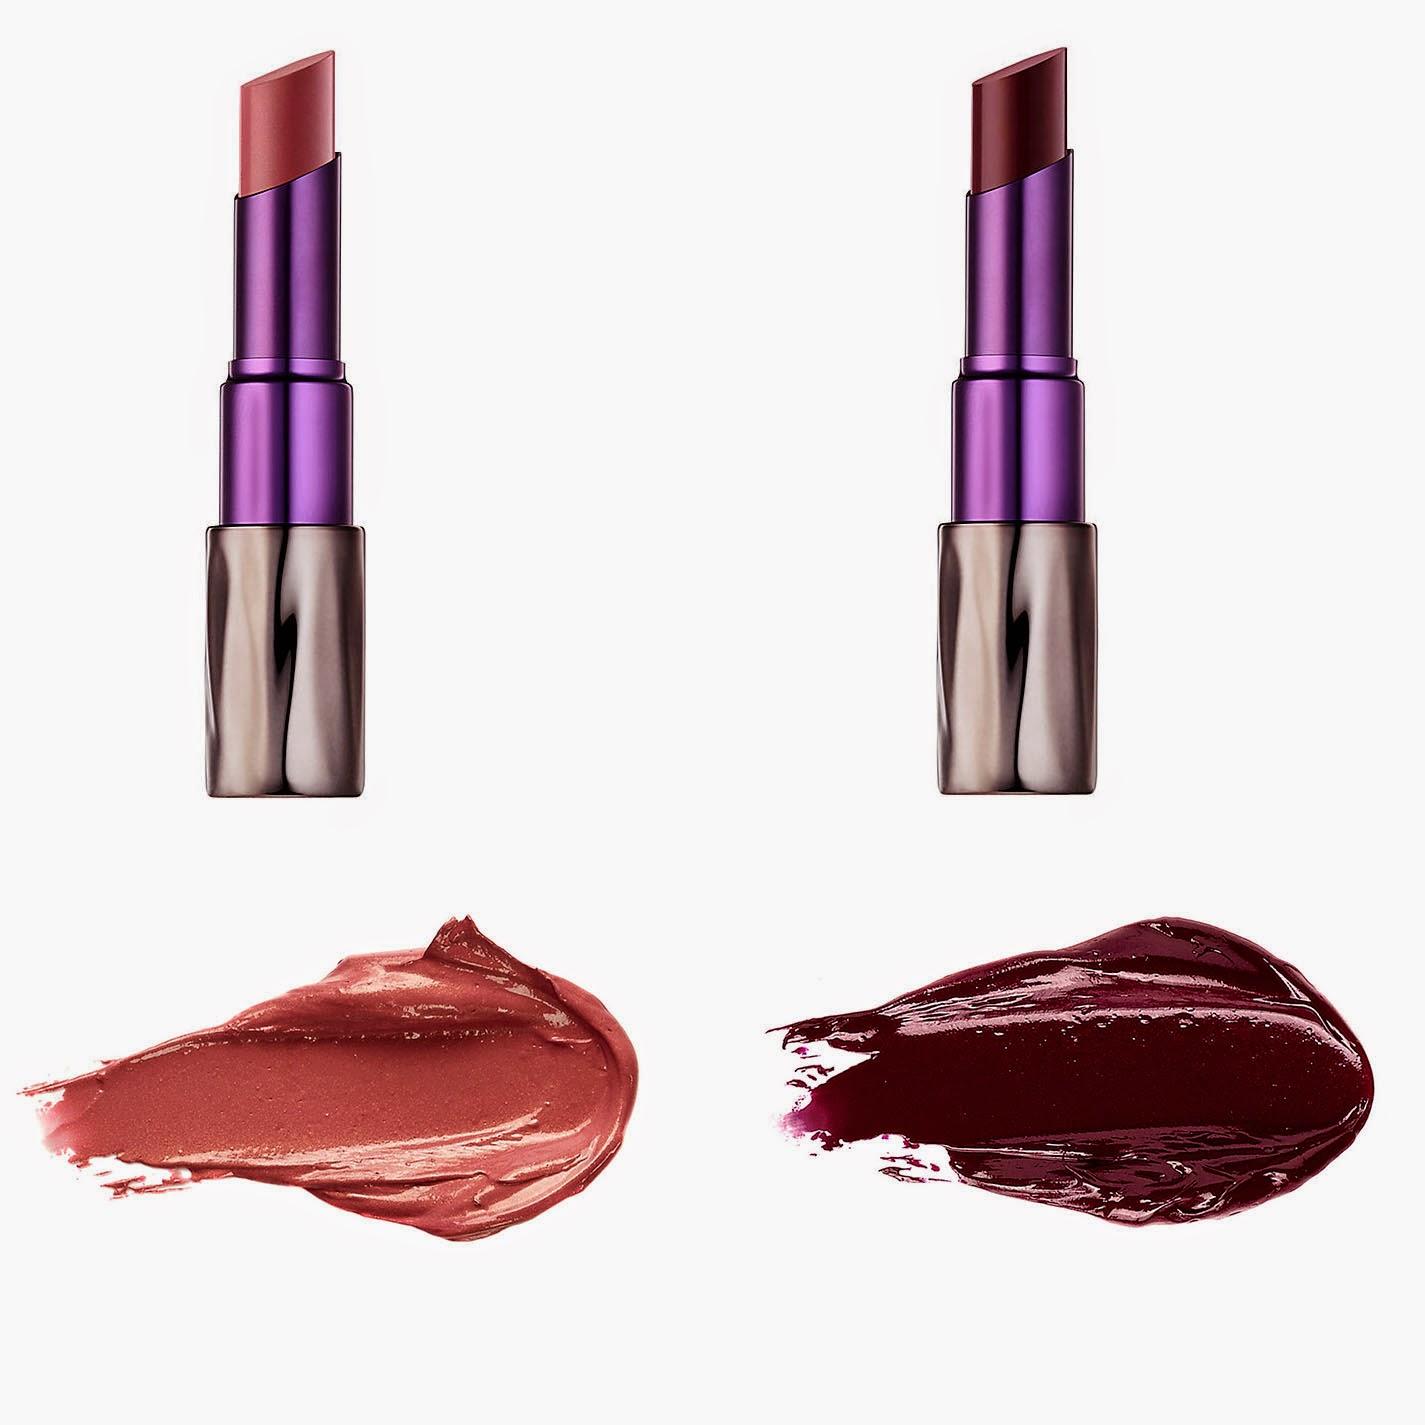 Urban Decay Naked Shame Lipstick